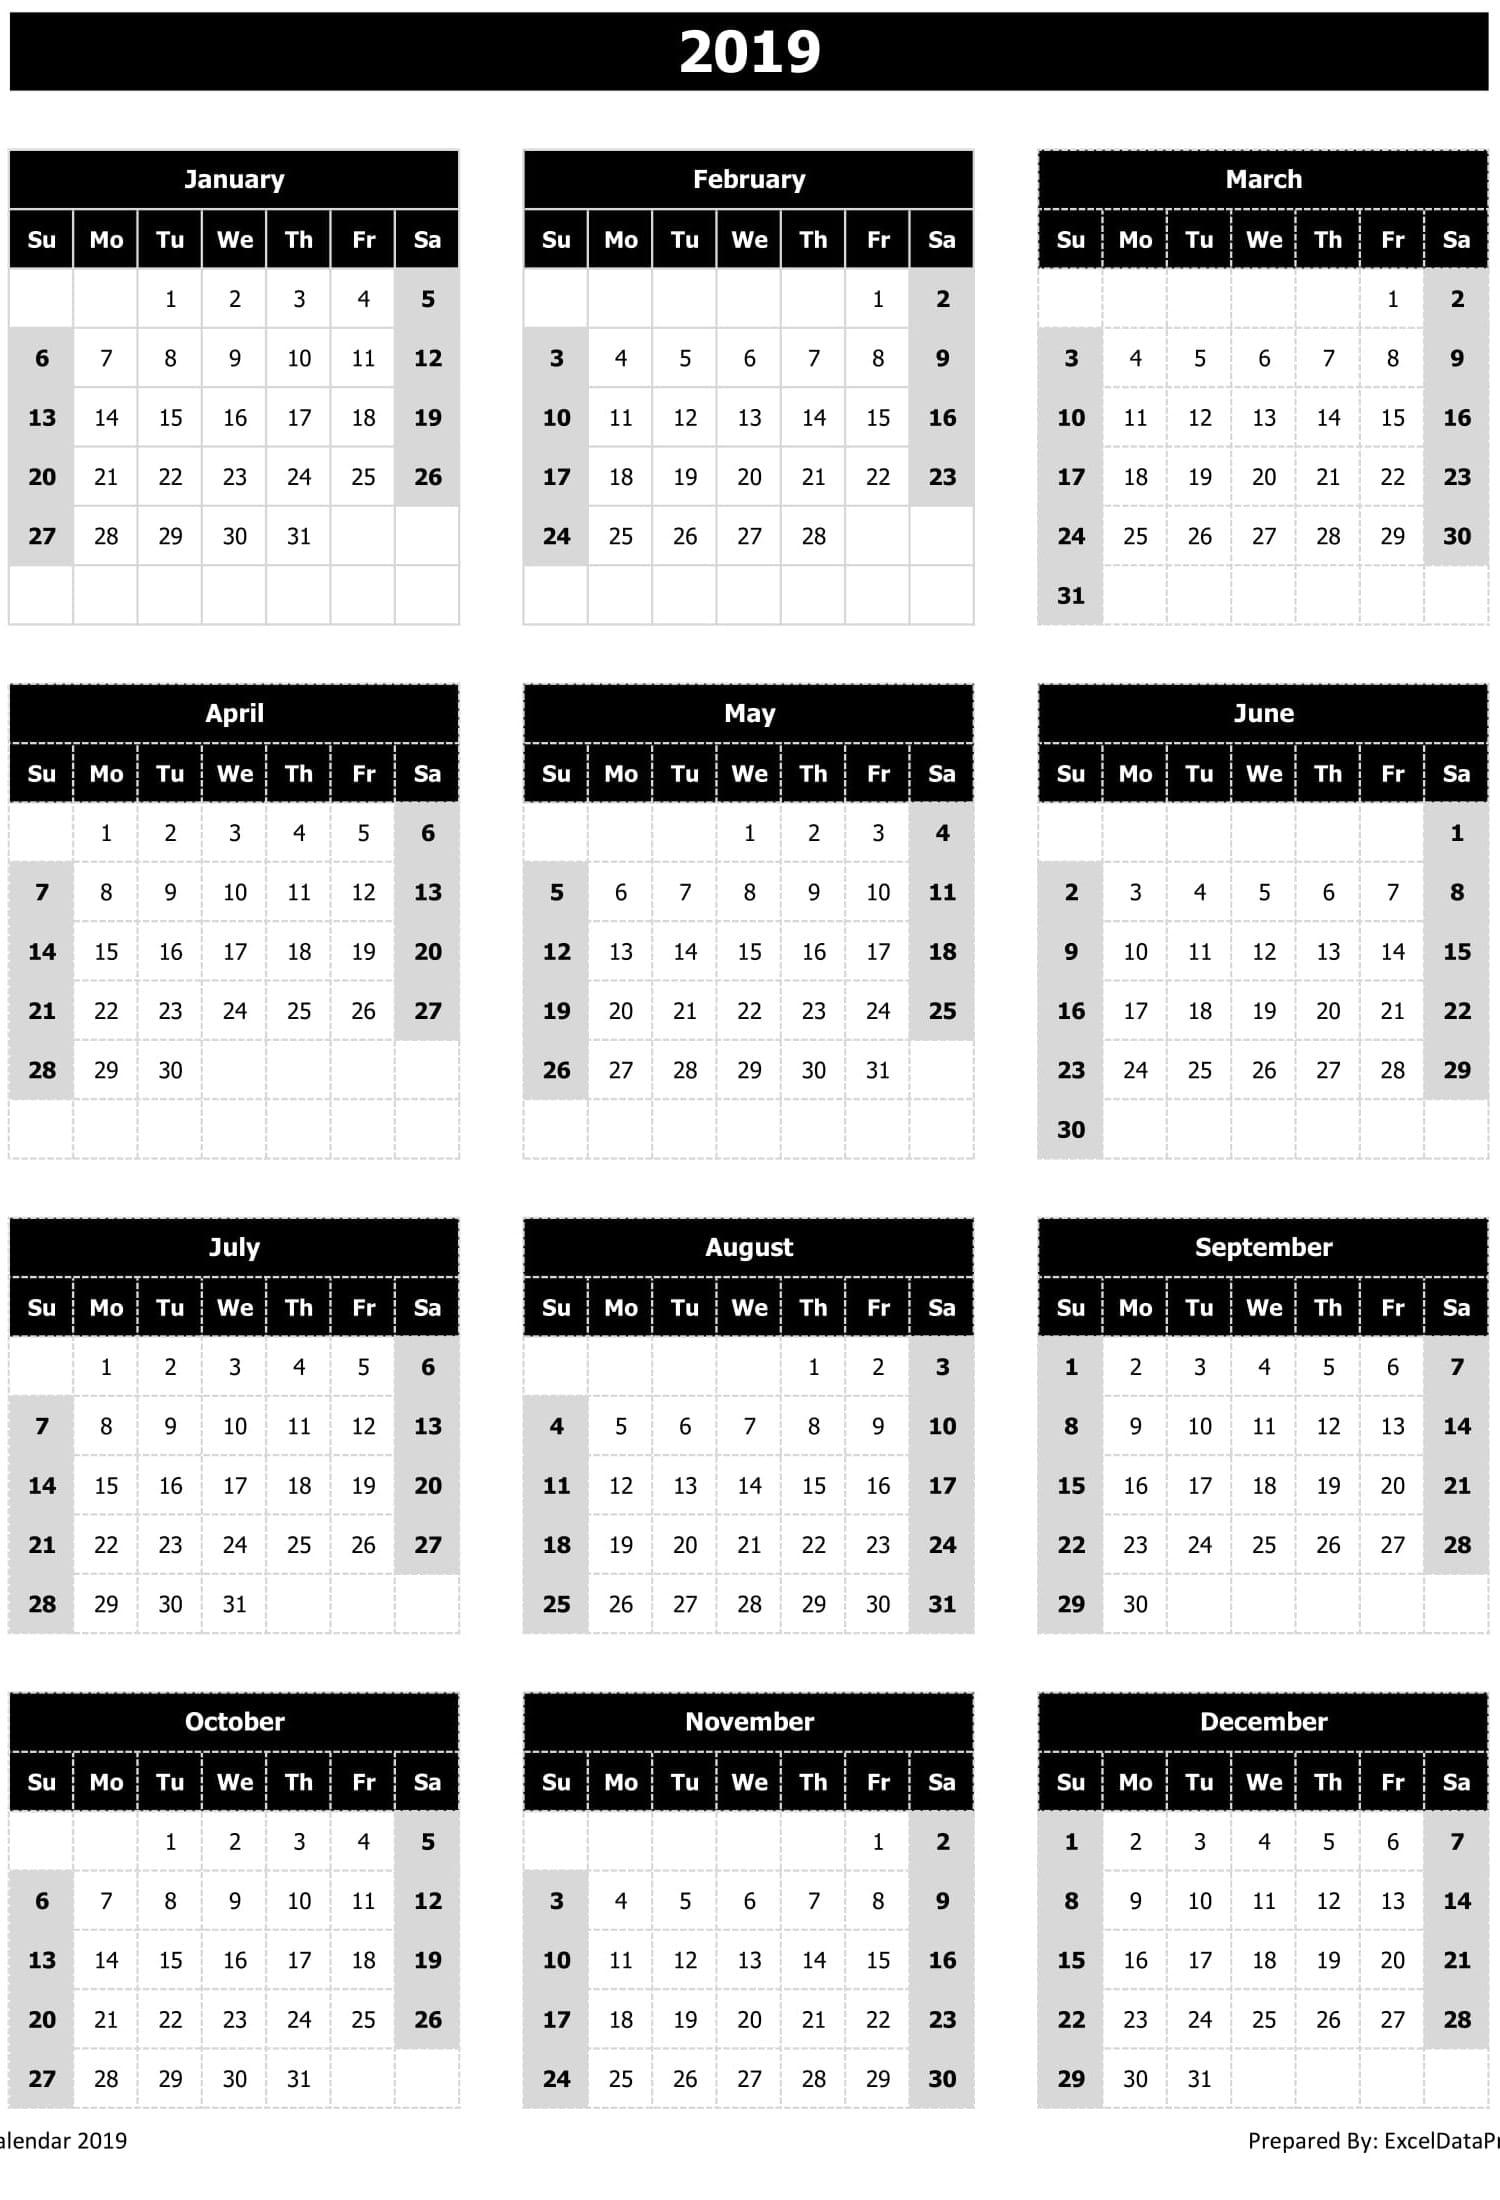 2019 Calendar Excel Templates, Printable PDFs & Images - ExcelDataPro